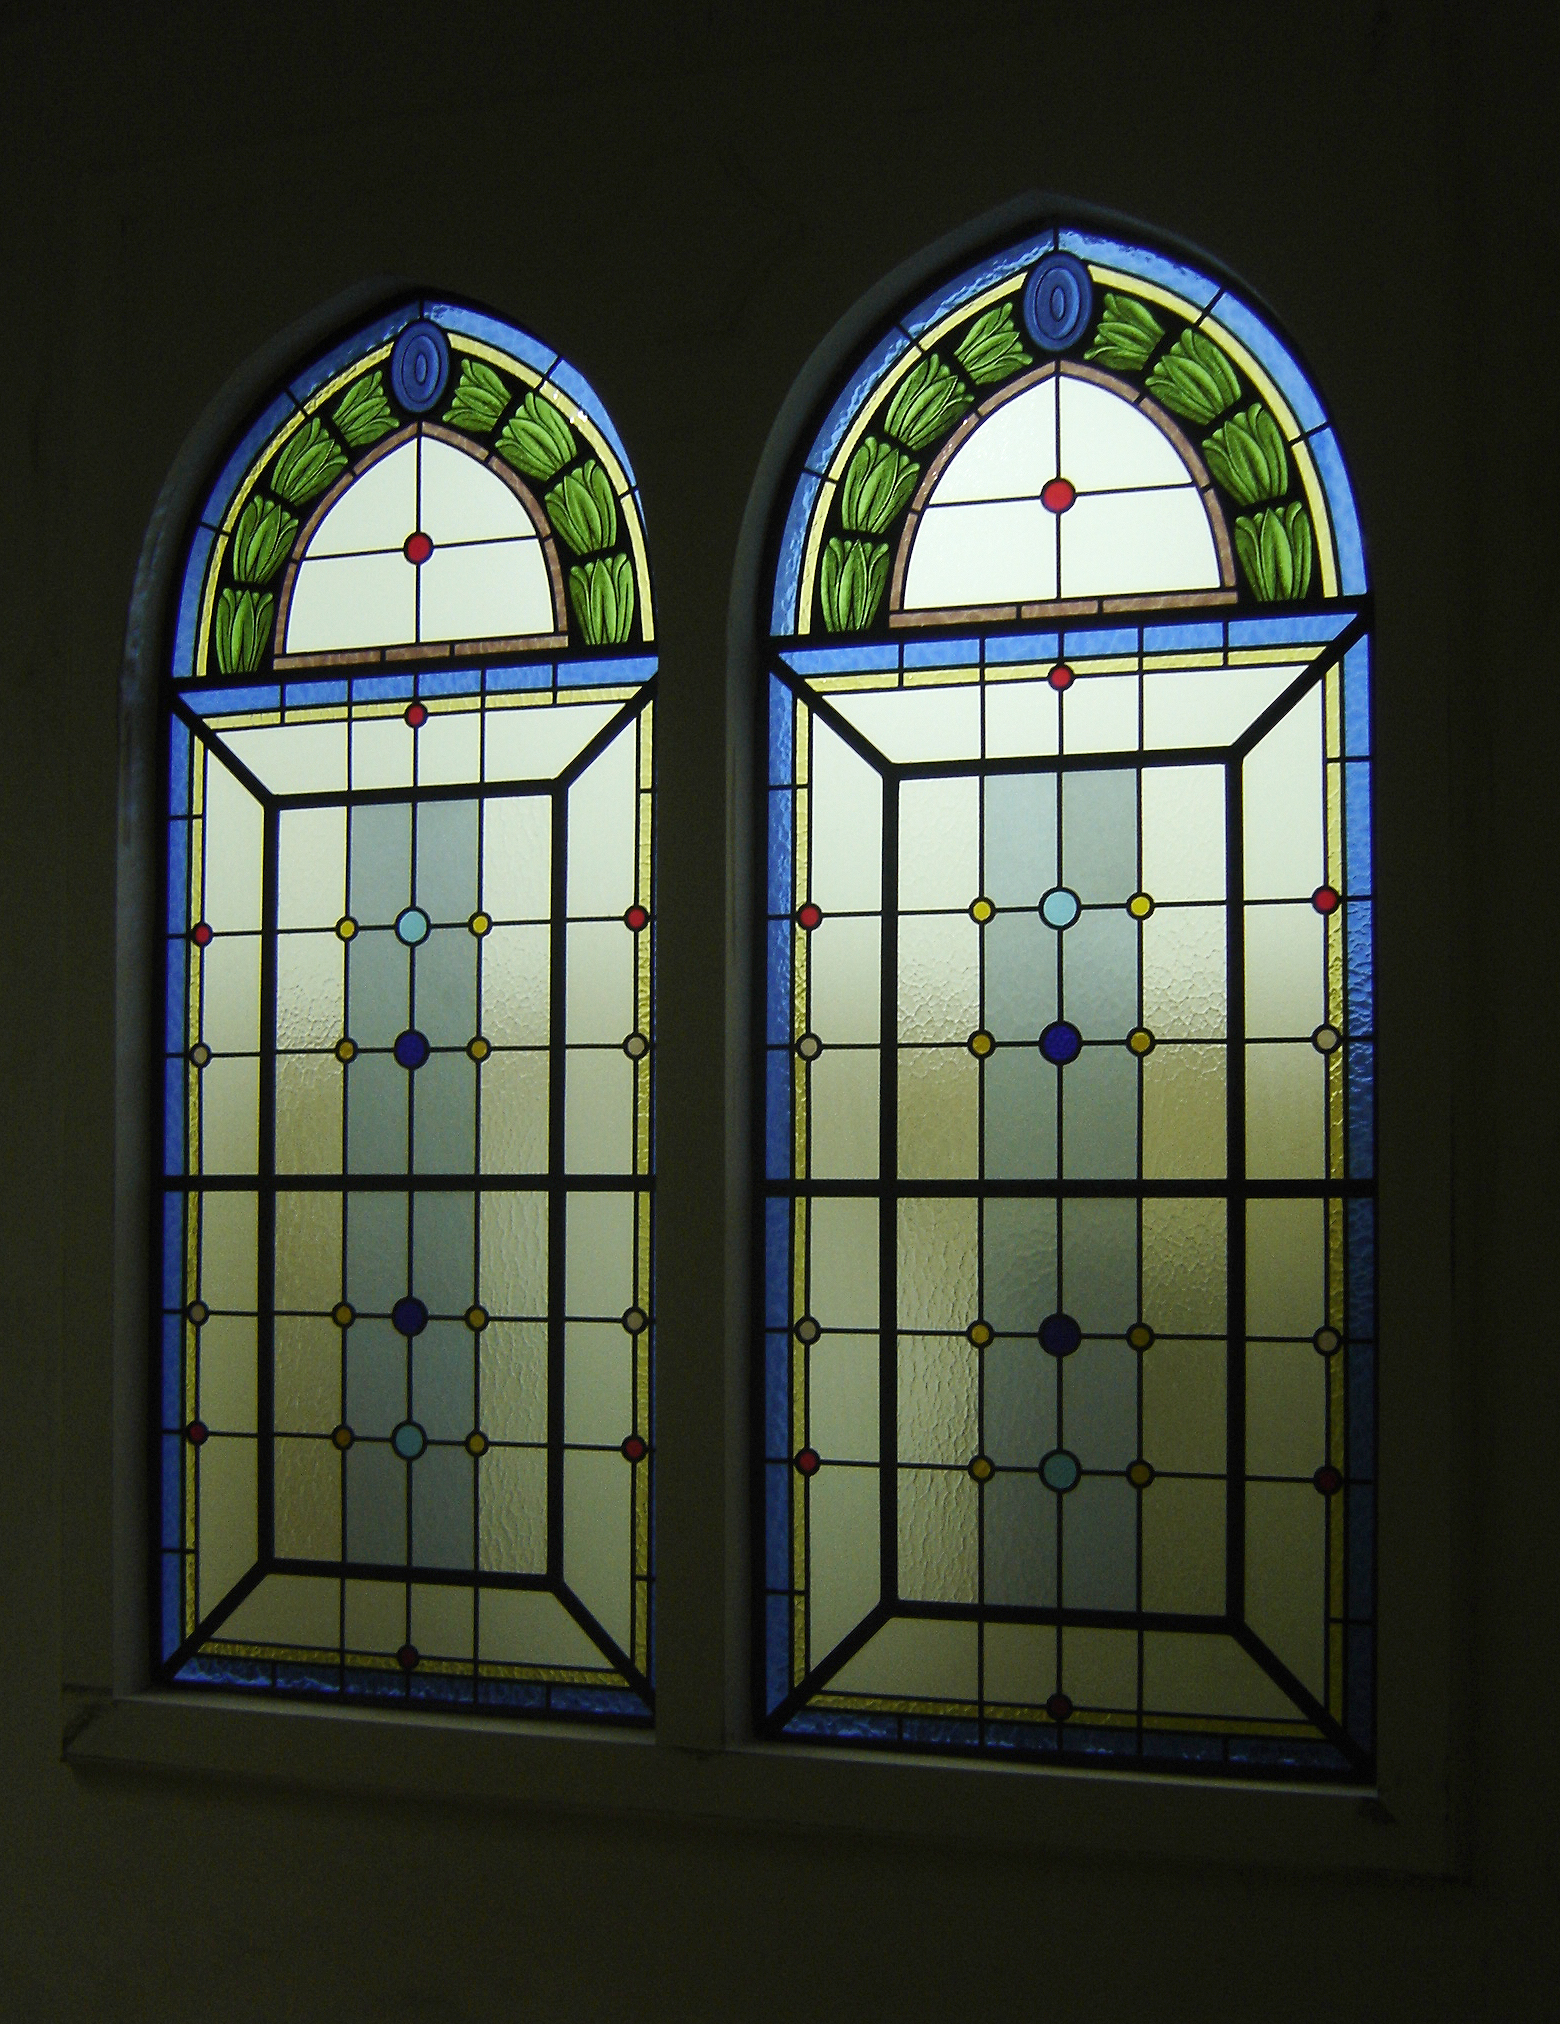 vitrais geométricos